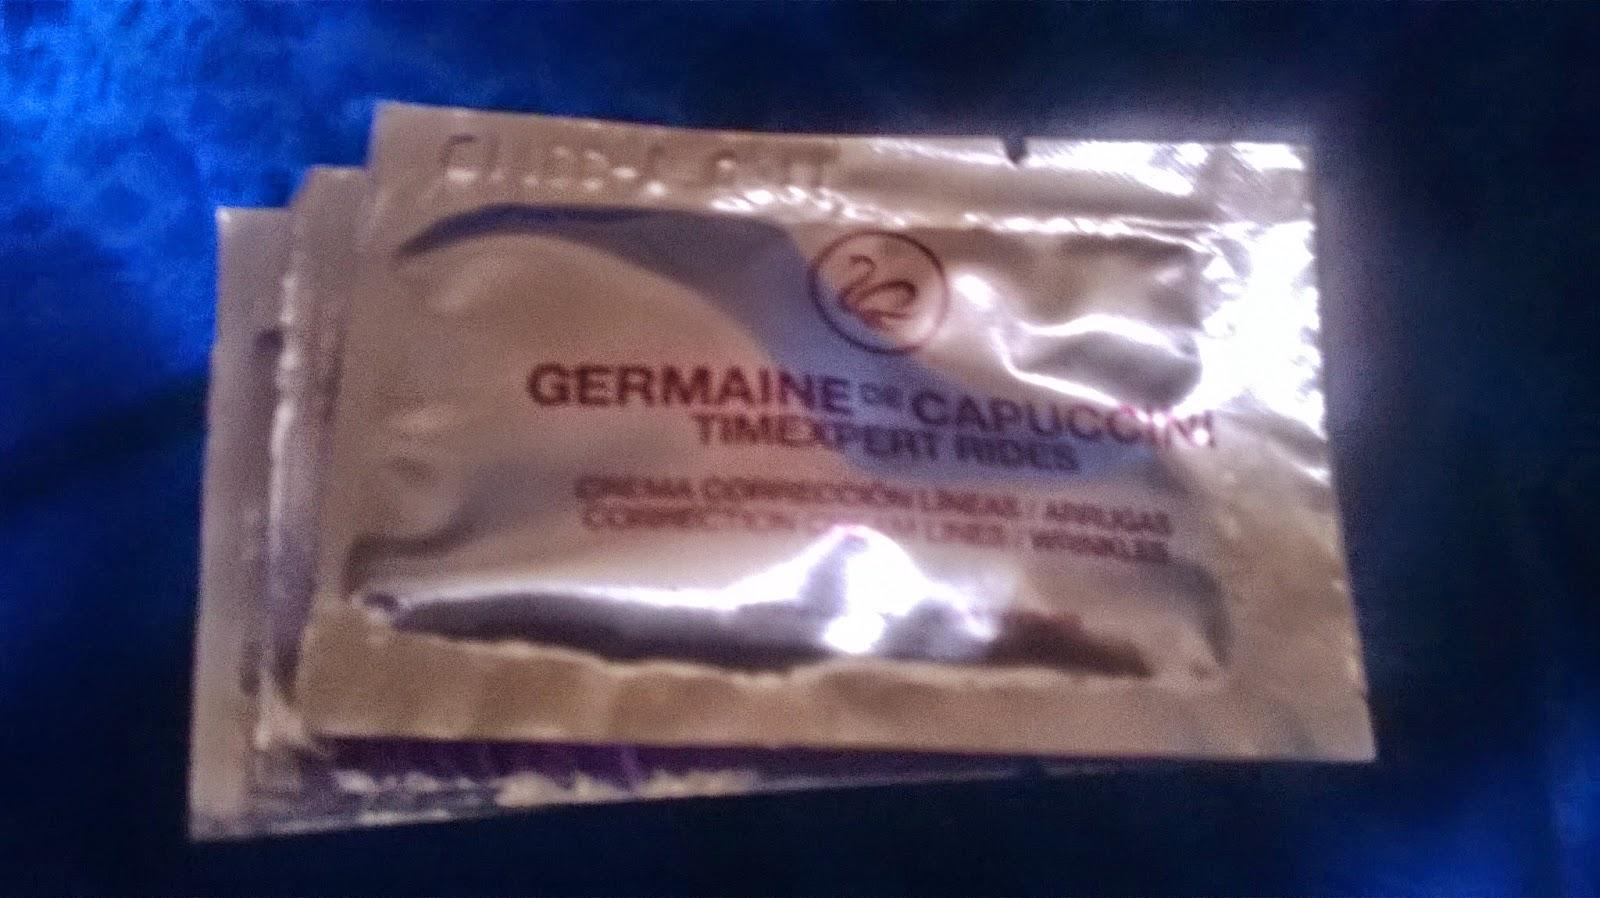 muestras germaine de capuccini